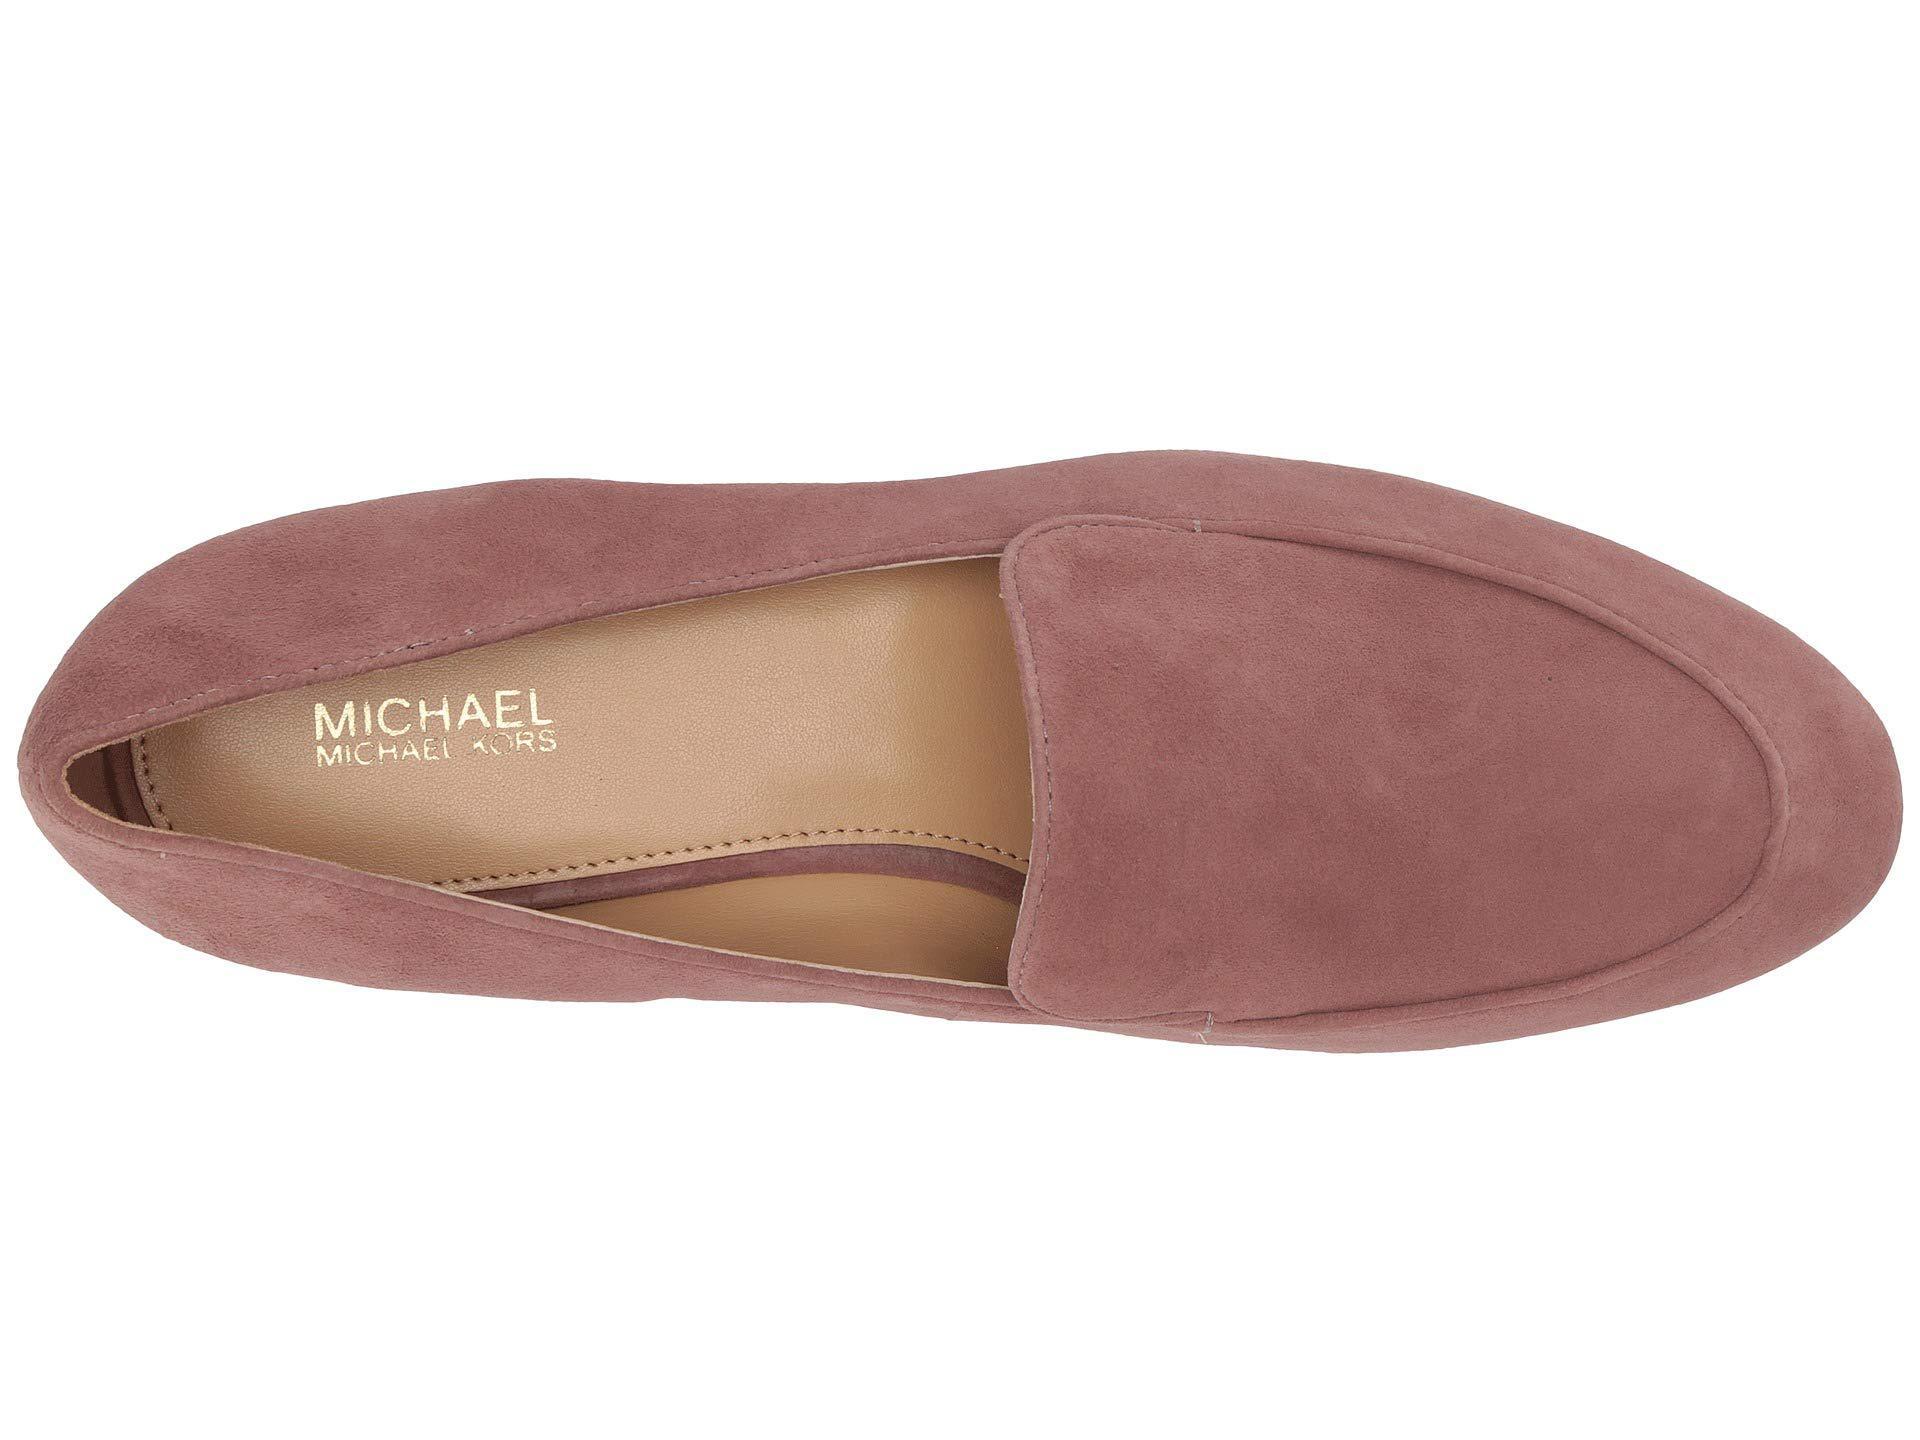 MICHAEL Michael Kors Leather Valerie